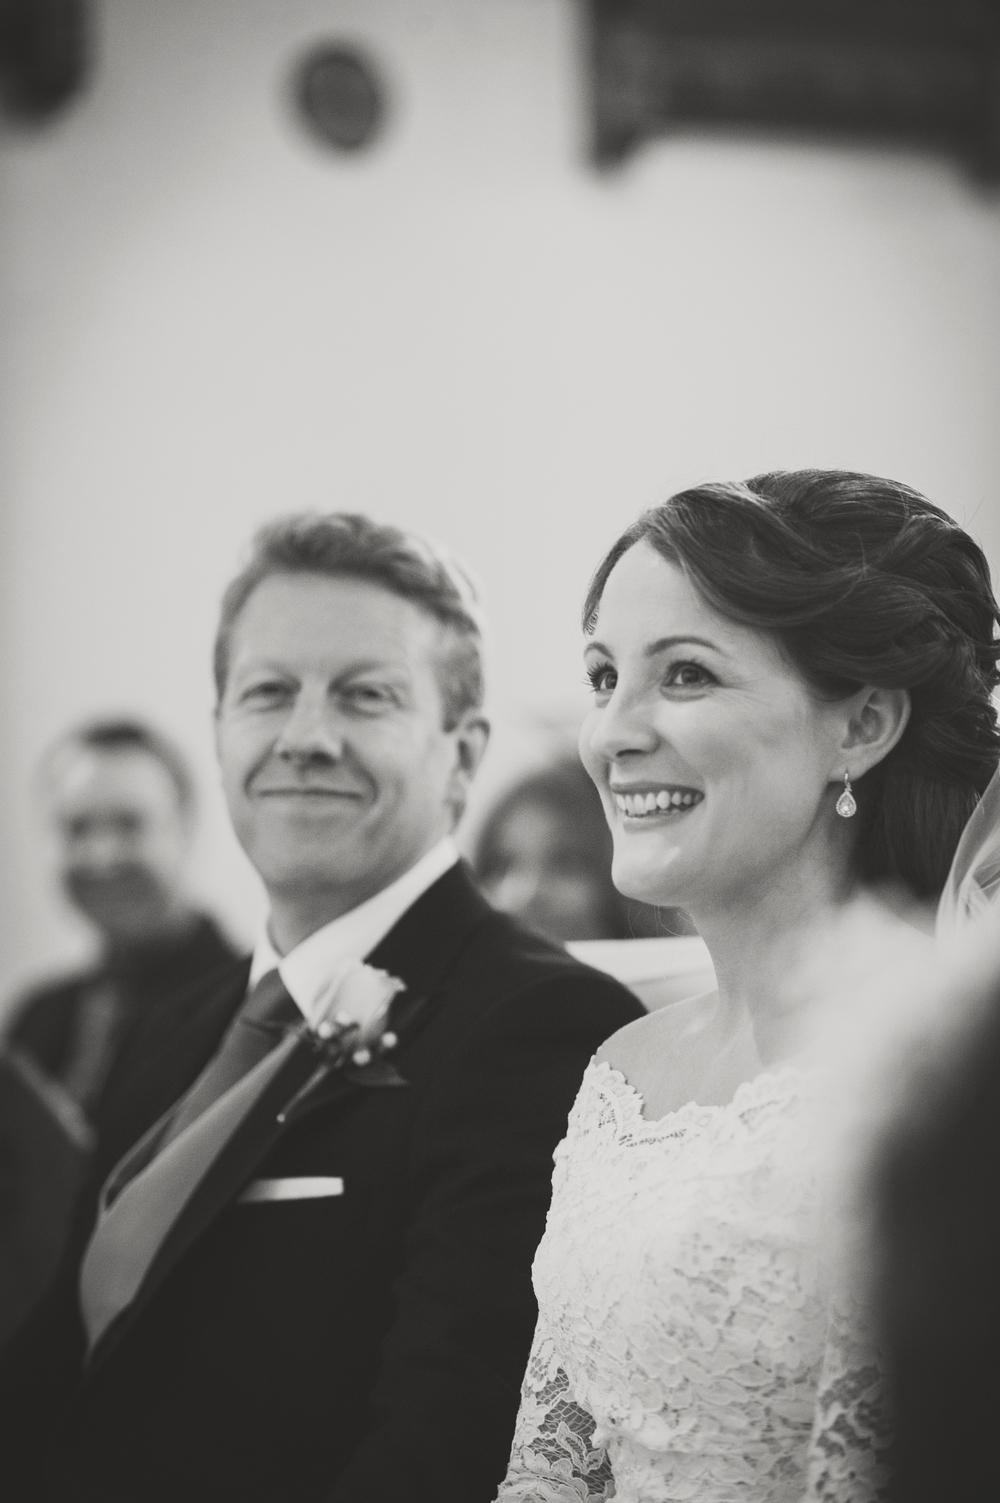 Carton_House_Wedding_Photography_Maynooth_Ireland_044.jpg